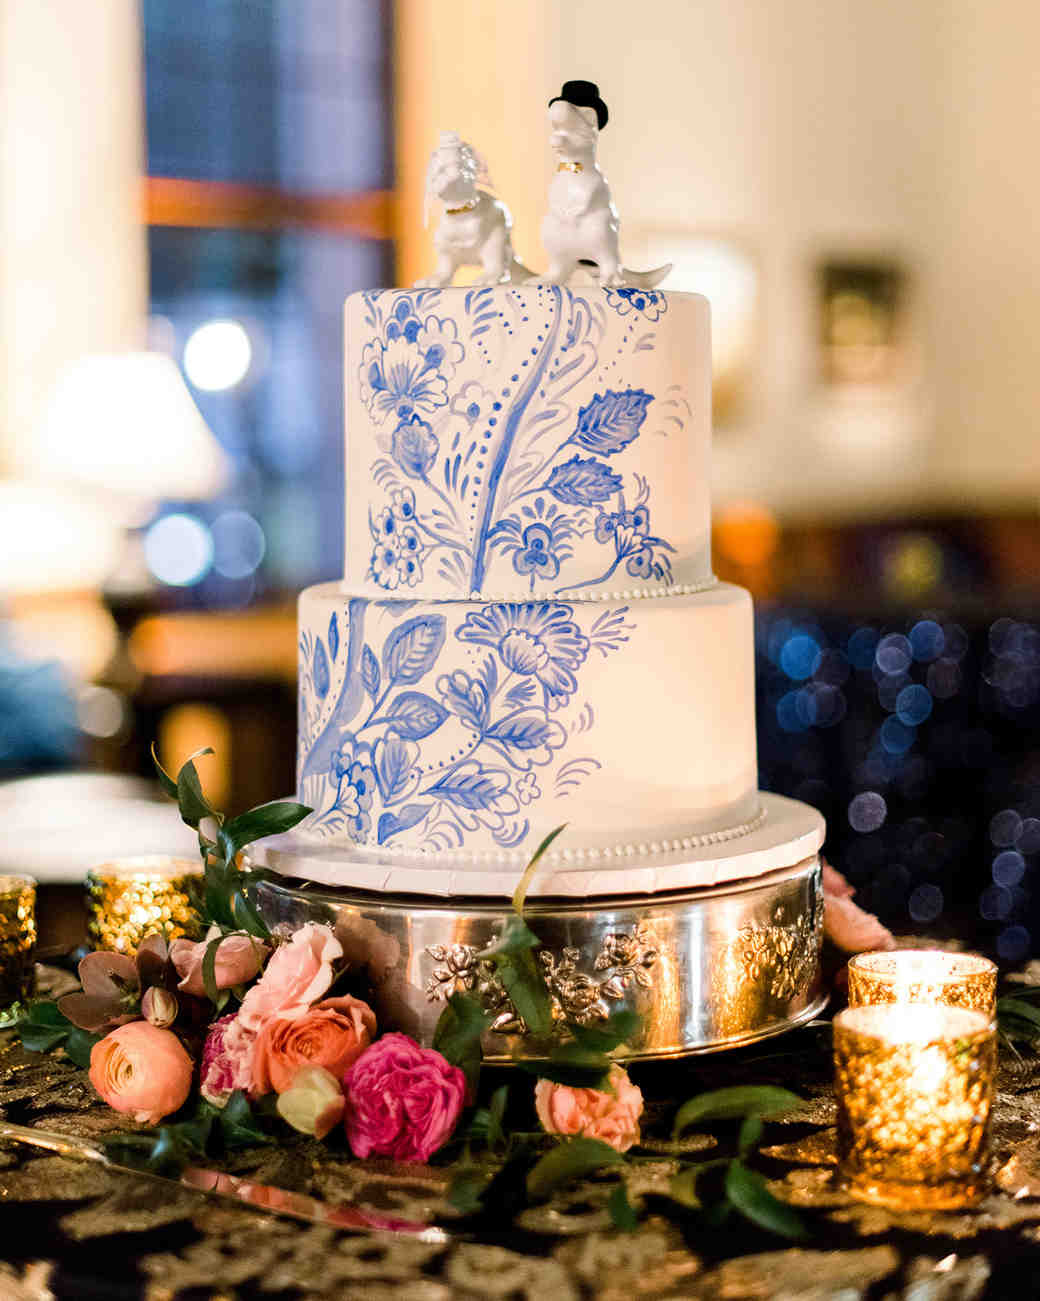 johanna erik wedding cake with dinosaur topper